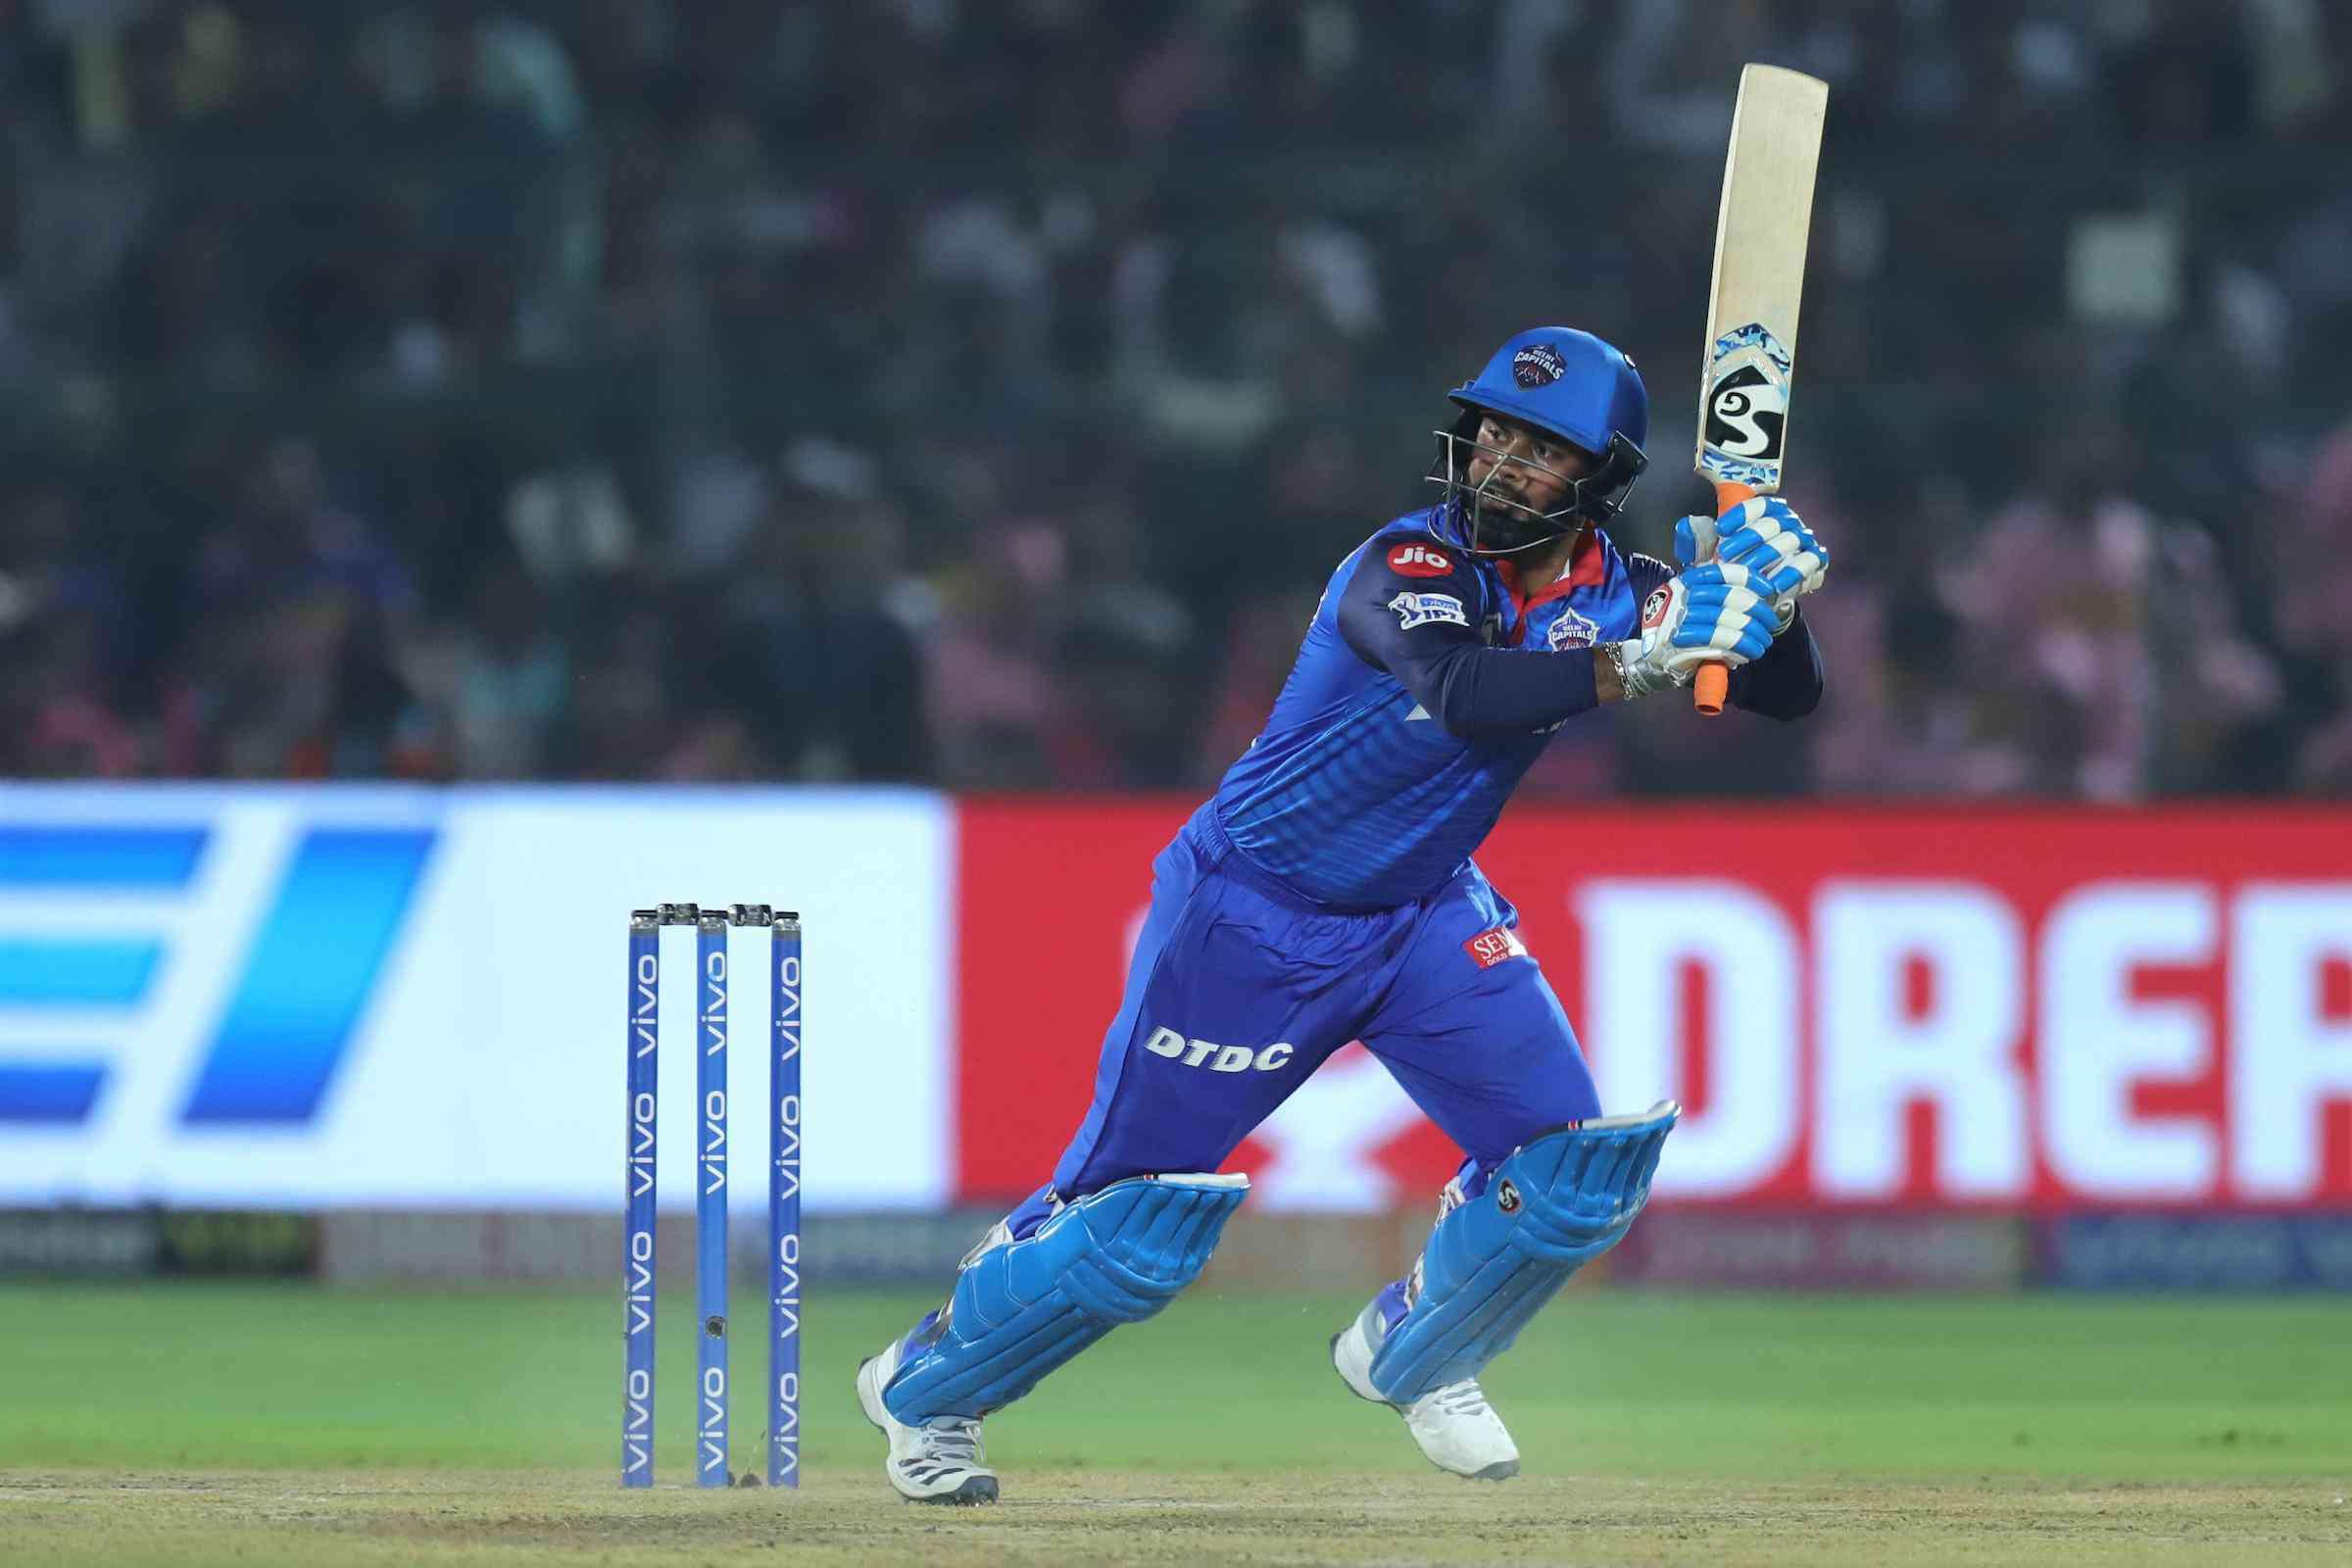 Deepak Malik/Sportzpics